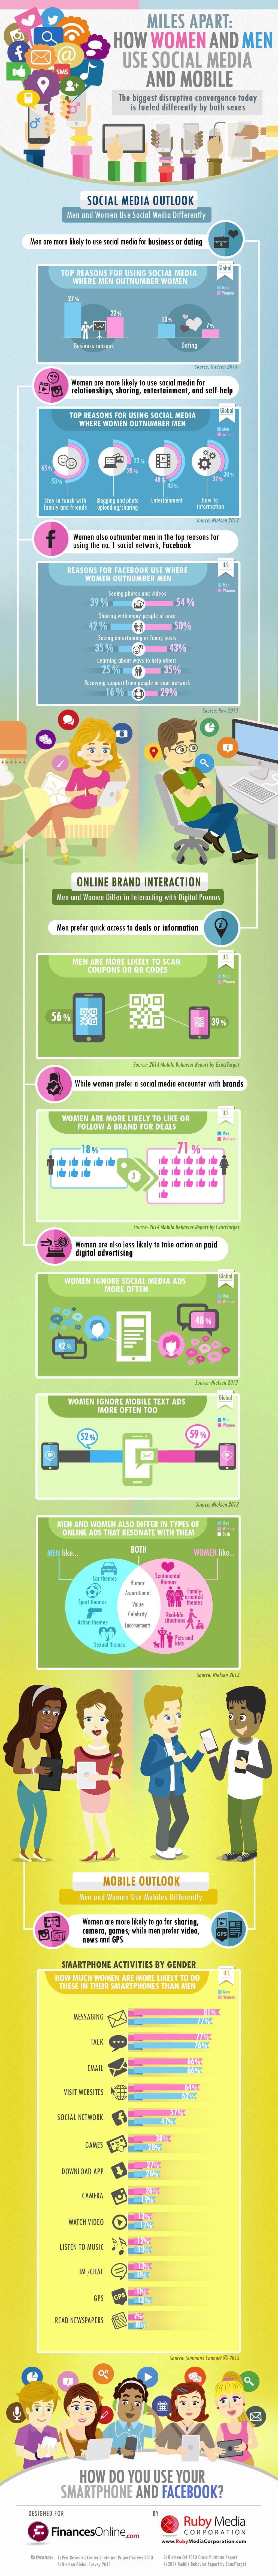 -smartphone-social-media-usage-men-vs-women-infographic